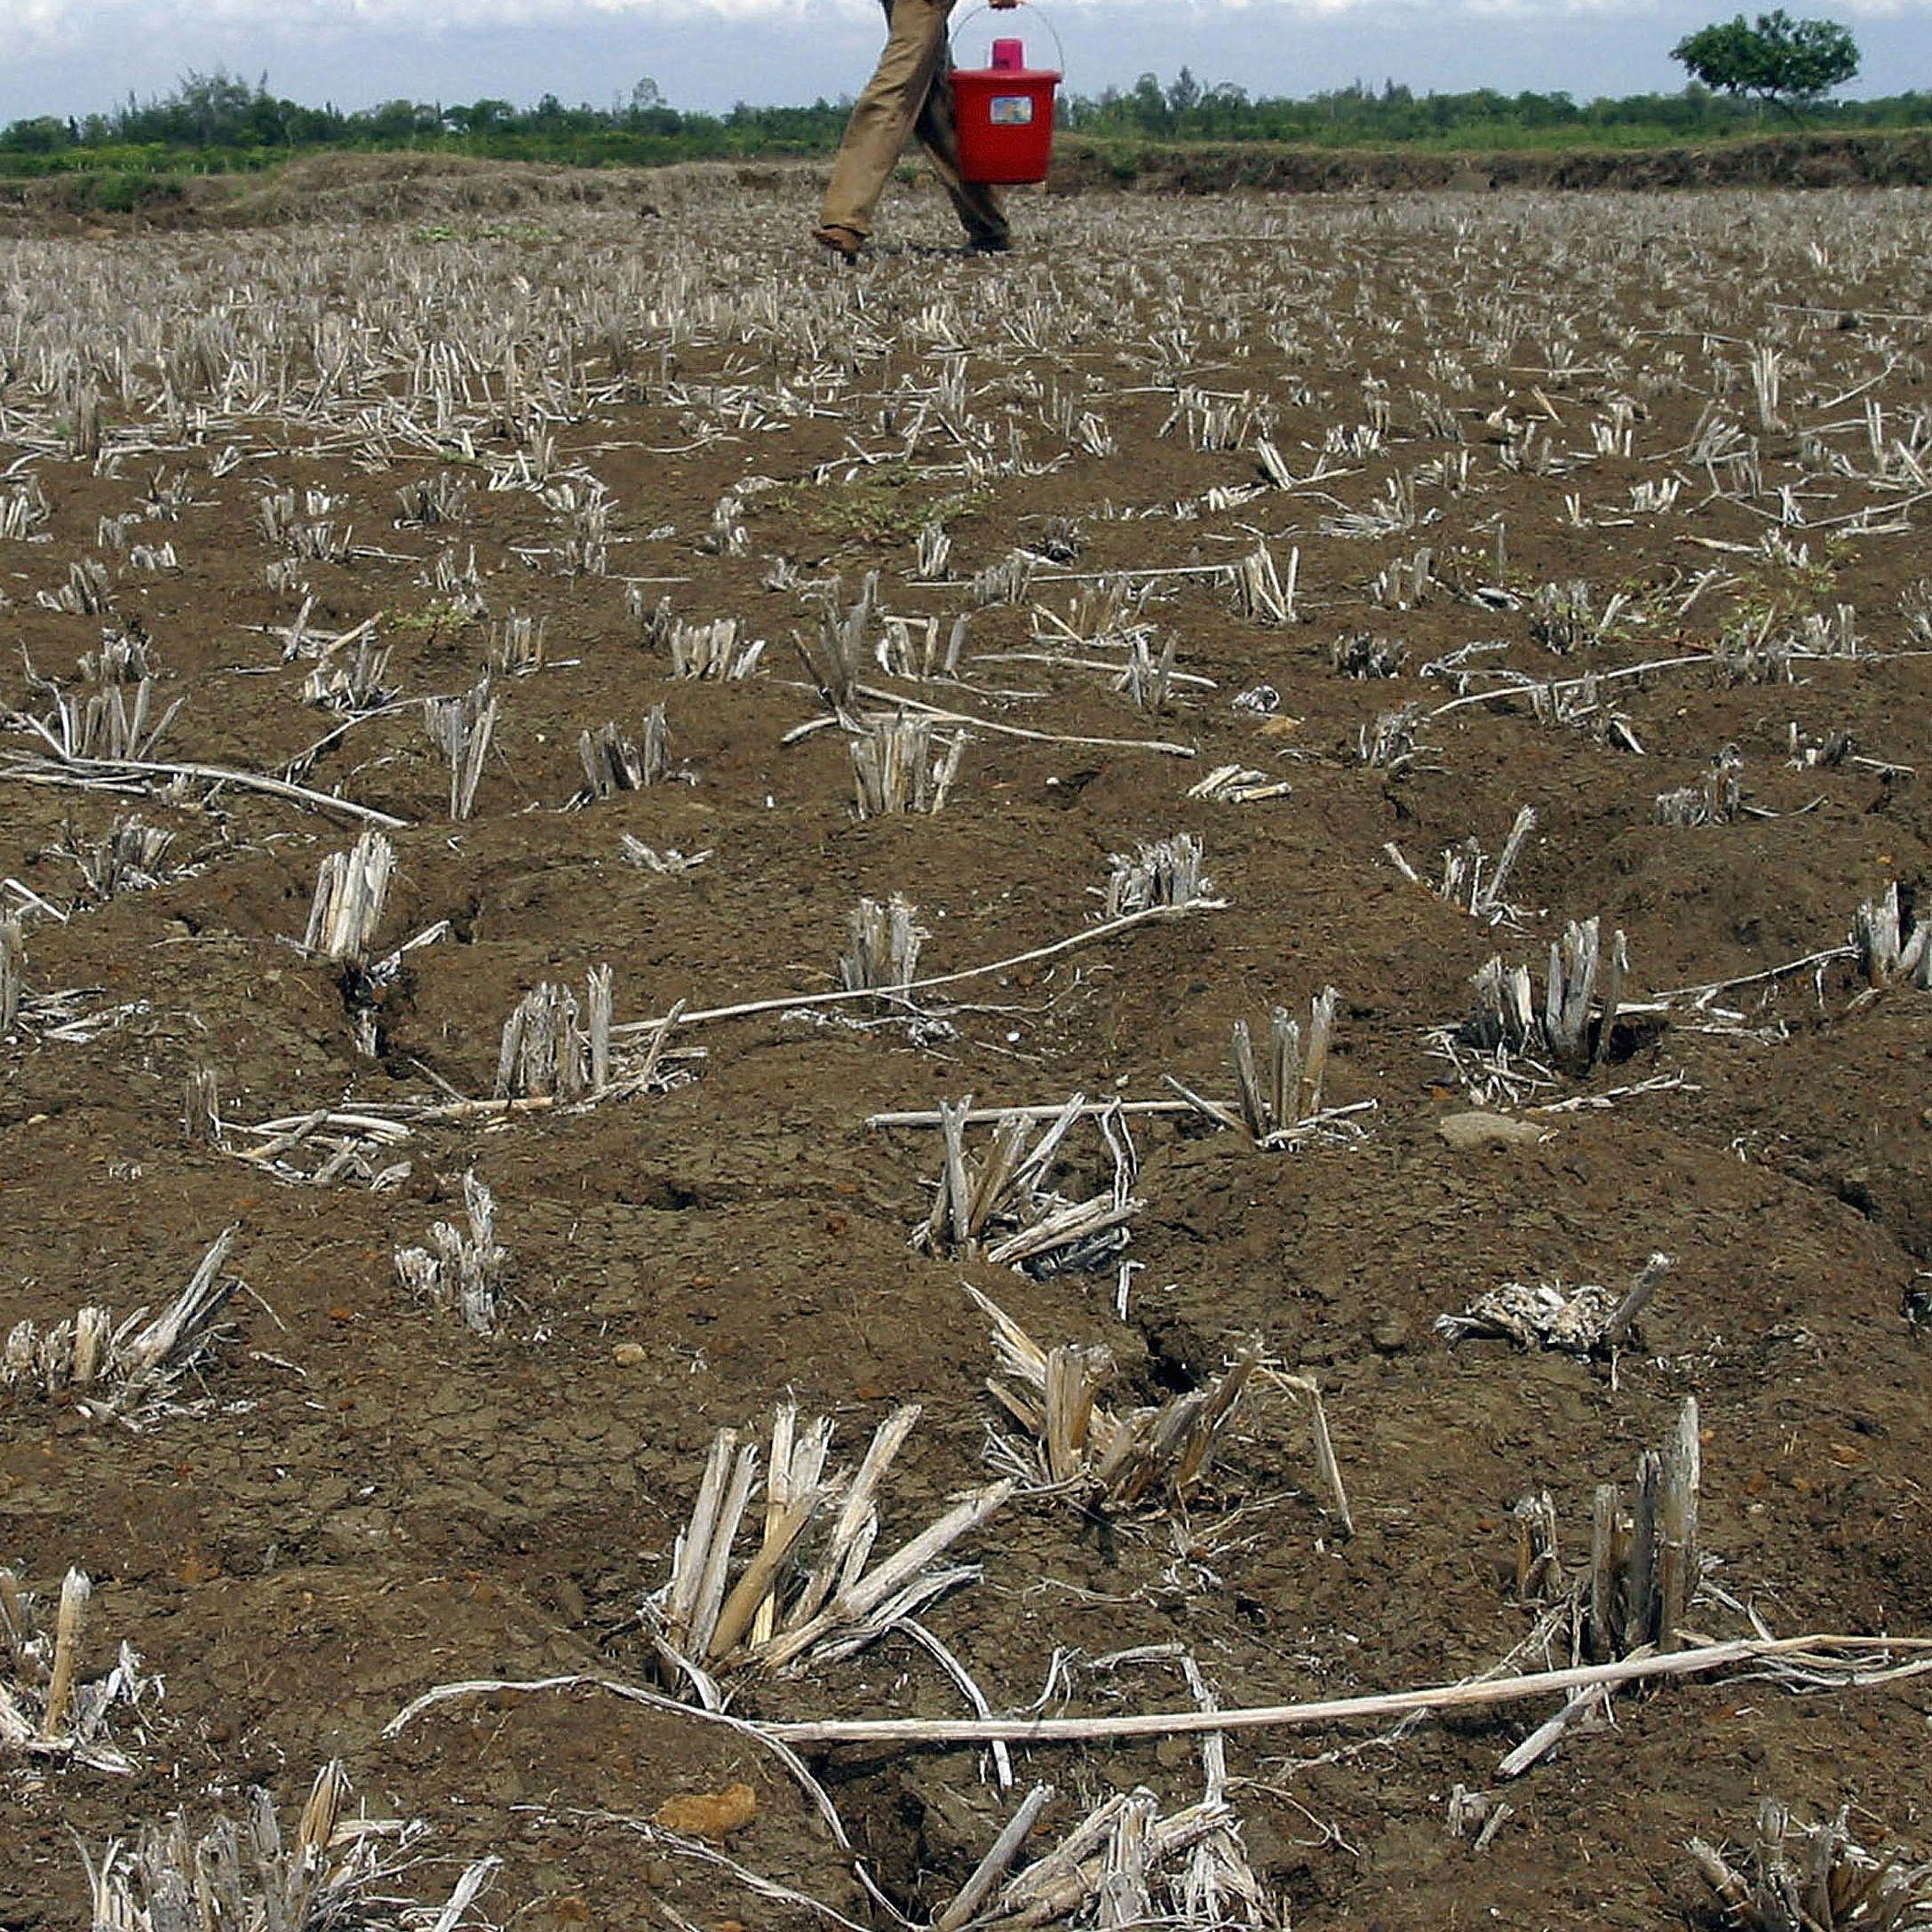 Man walking through dry crop field.